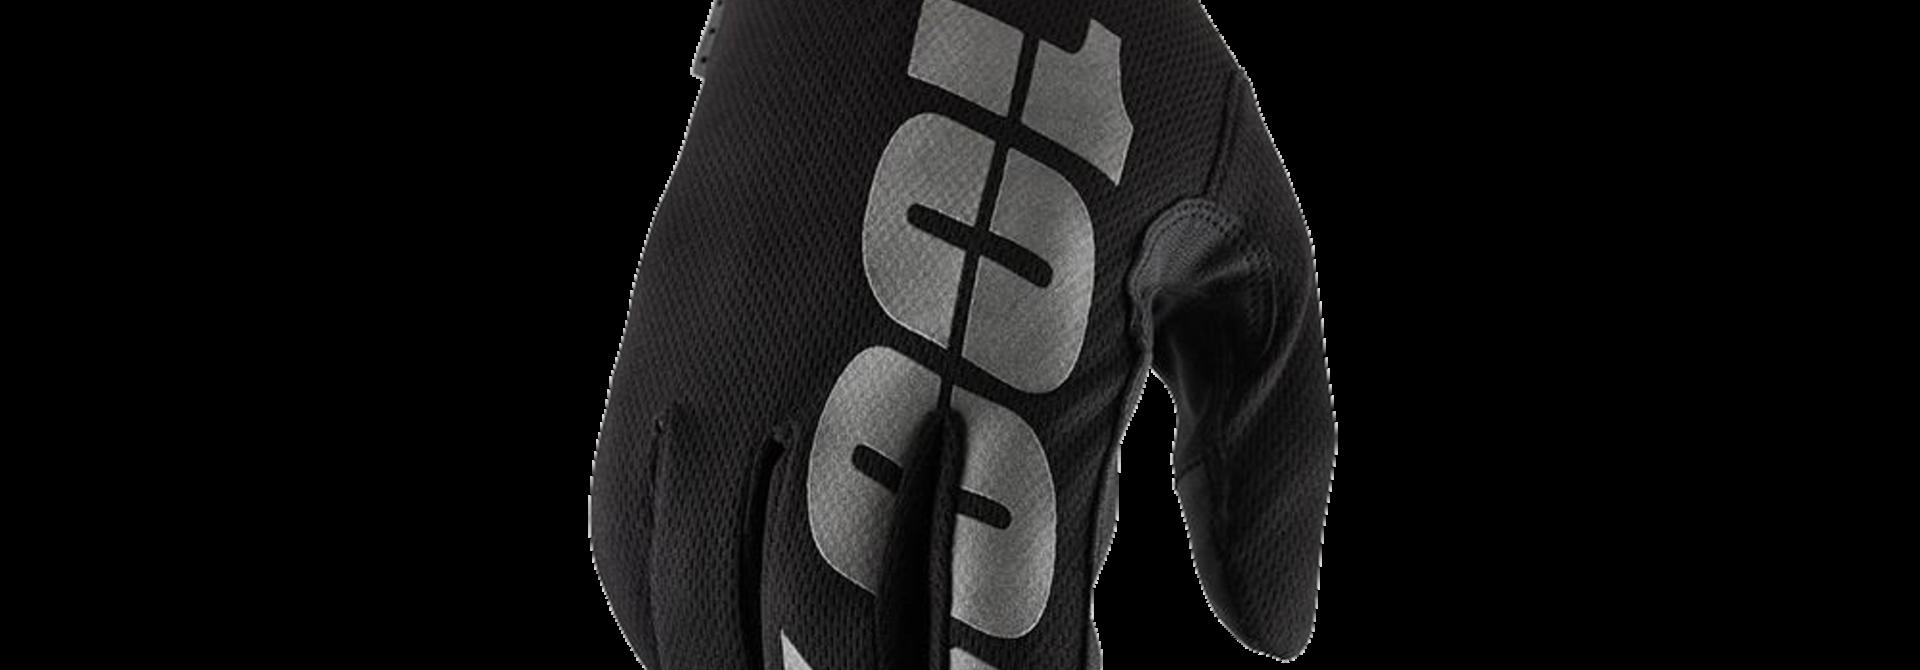 100% Hydromatic Gloves / Men's